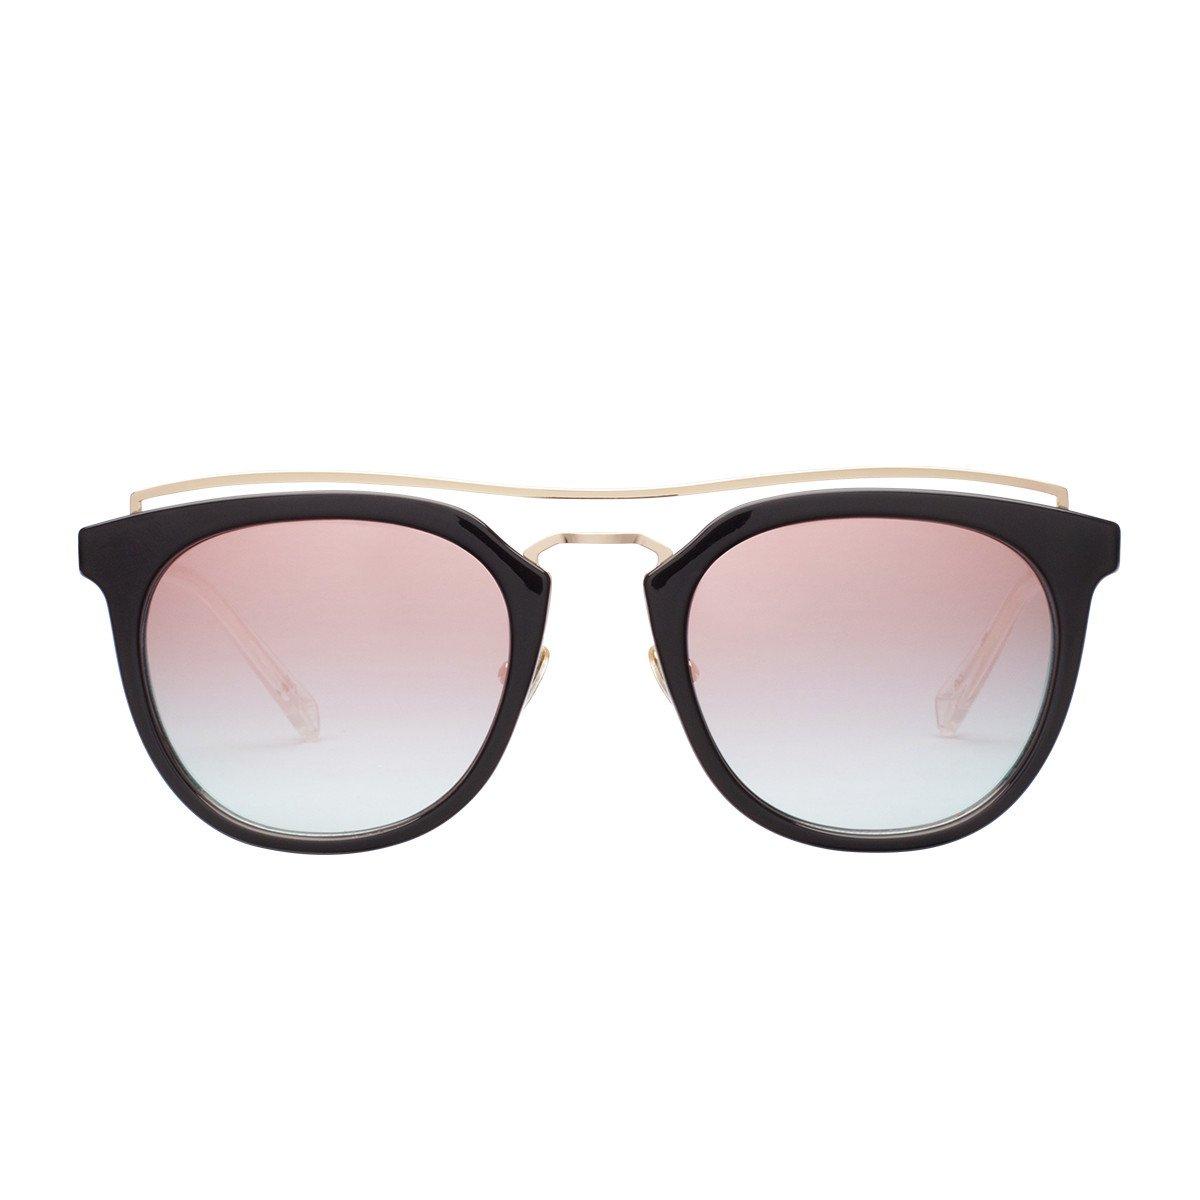 acf929f431e80 Amazon.com  PERVERSE sunglasses Lynna Clubmaster Sunglasses (Black ...